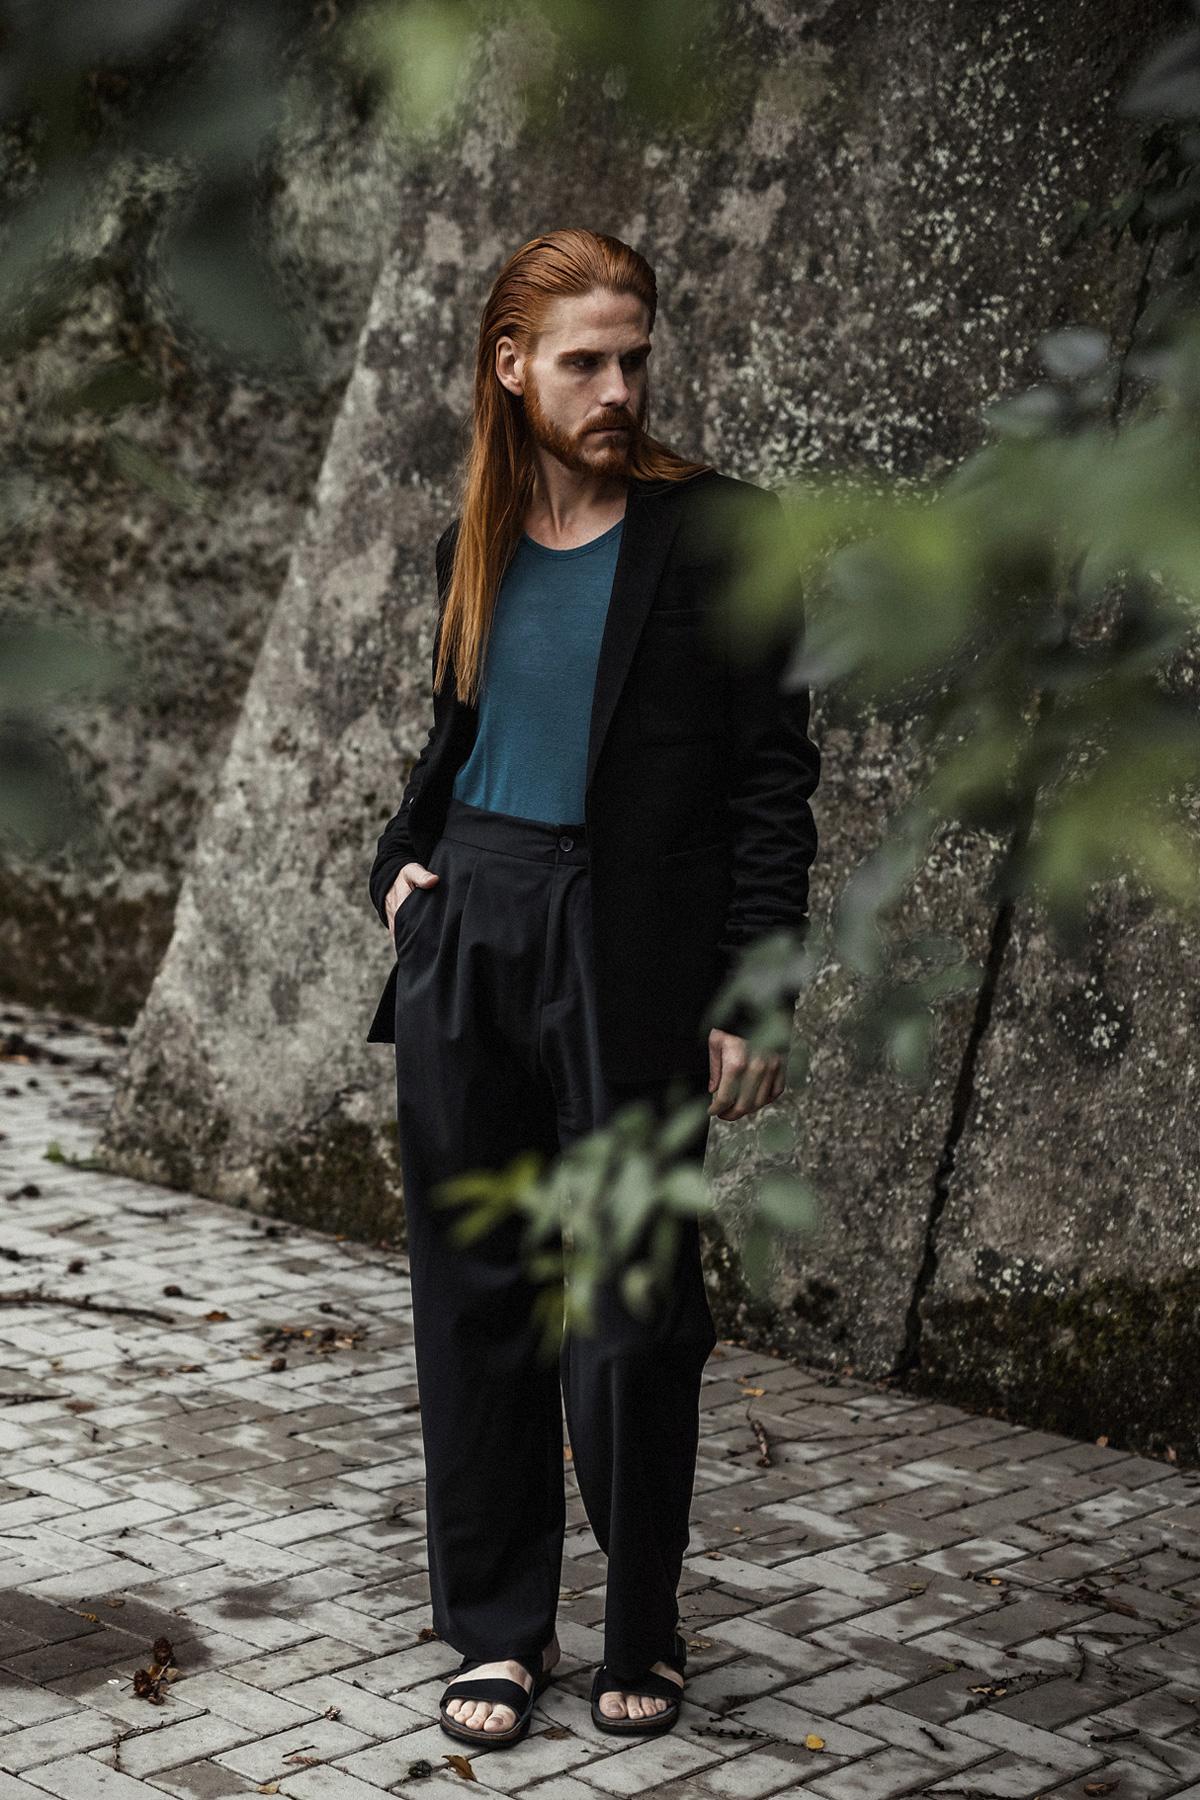 Modeblog-Malefashion-Modetrend-Sakko-Stoffhose-Herbst-Sandalen-Elegante-Kombination